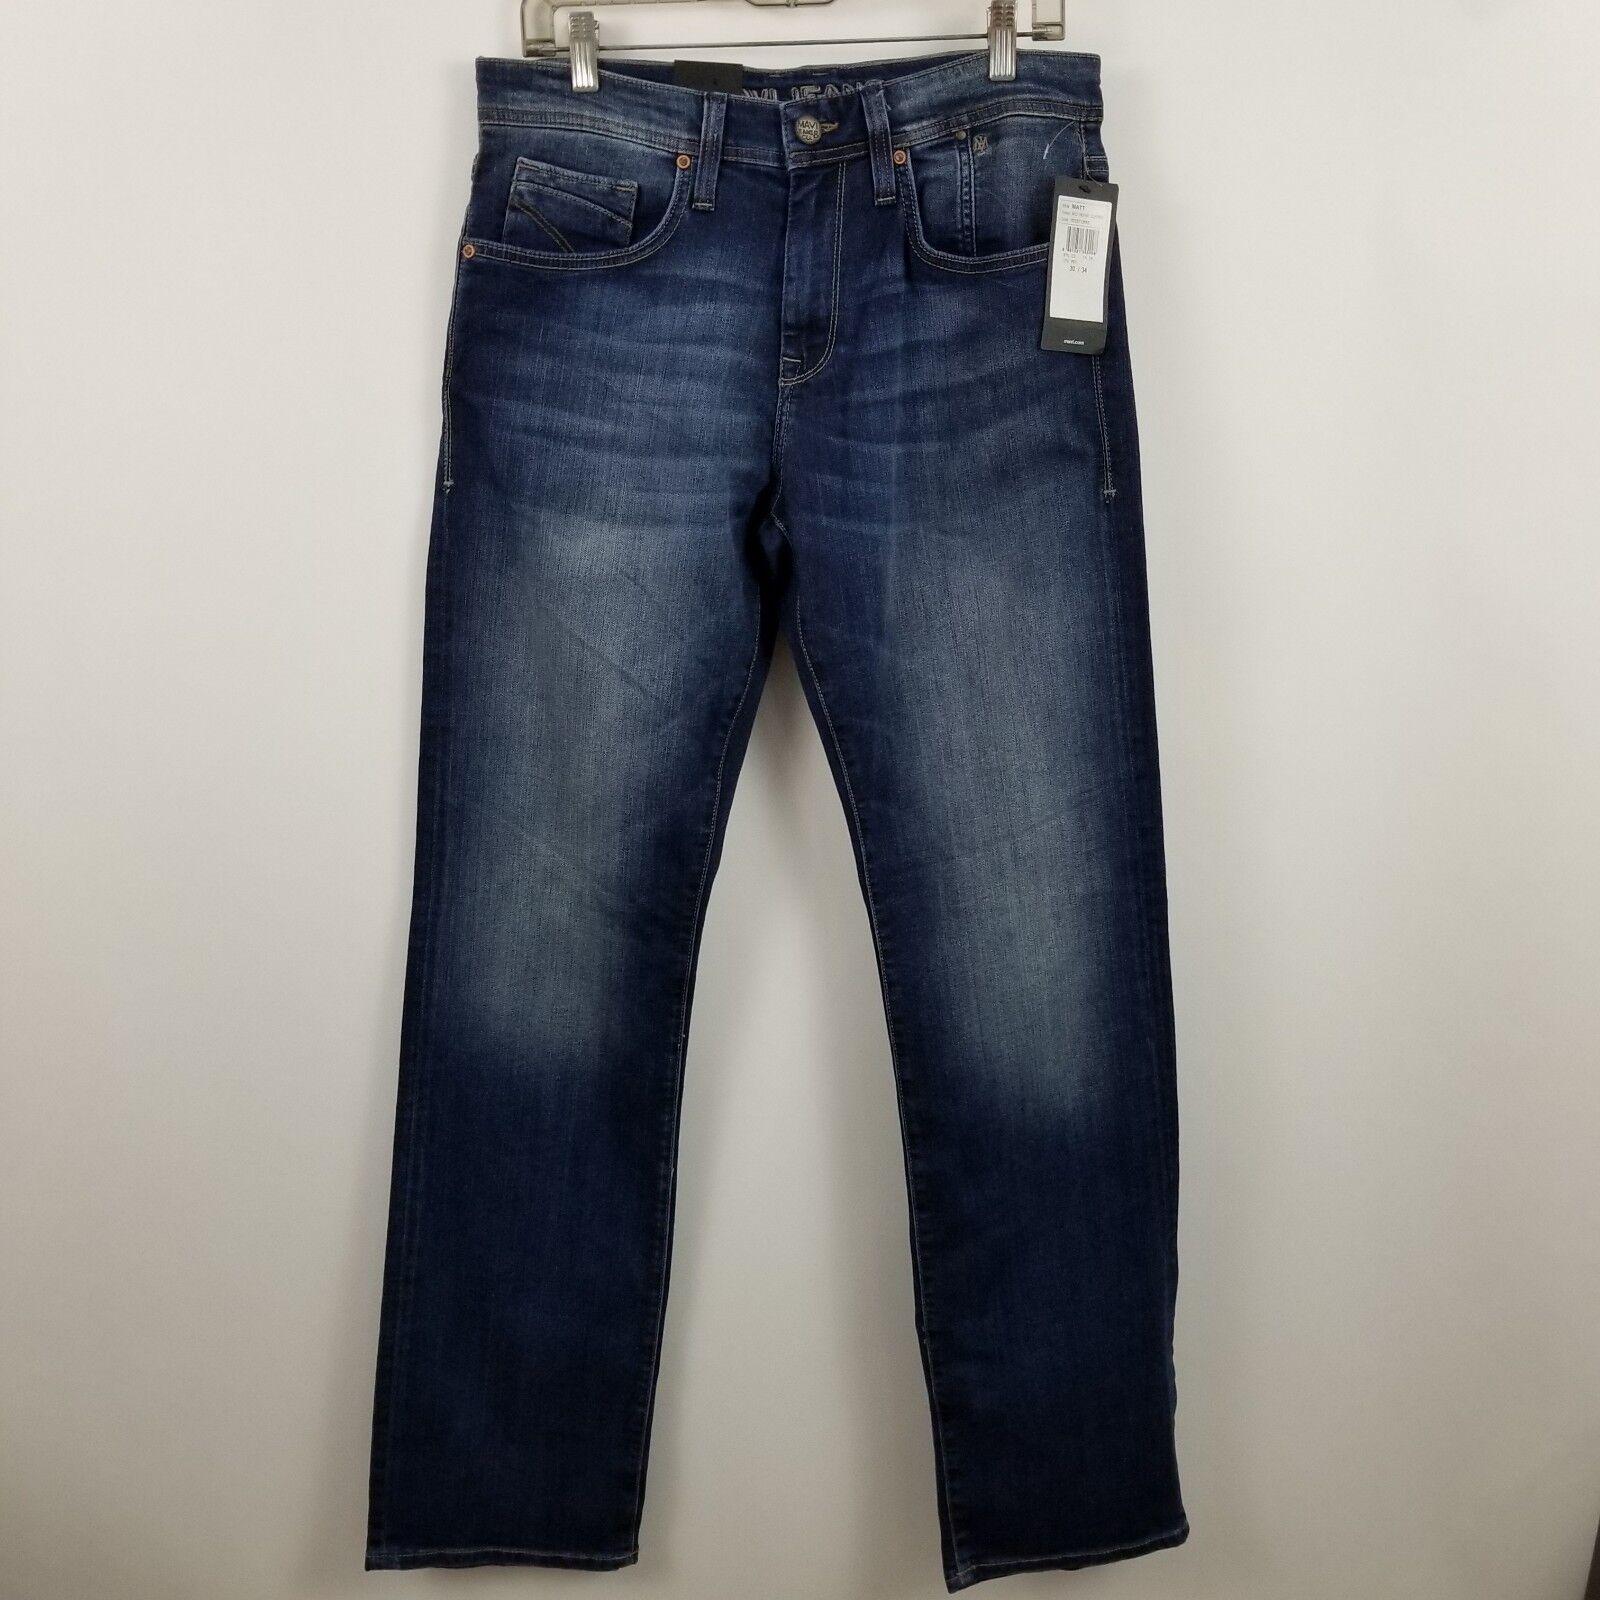 6bf42aa6 Mavi Matt Relaxed Straight Leg Mens Dark bluee Jeans Size 30 x 34 NWT Wash  nwvysu4491-Jeans. Menu. BLOOMINGDALE'S Men's ...